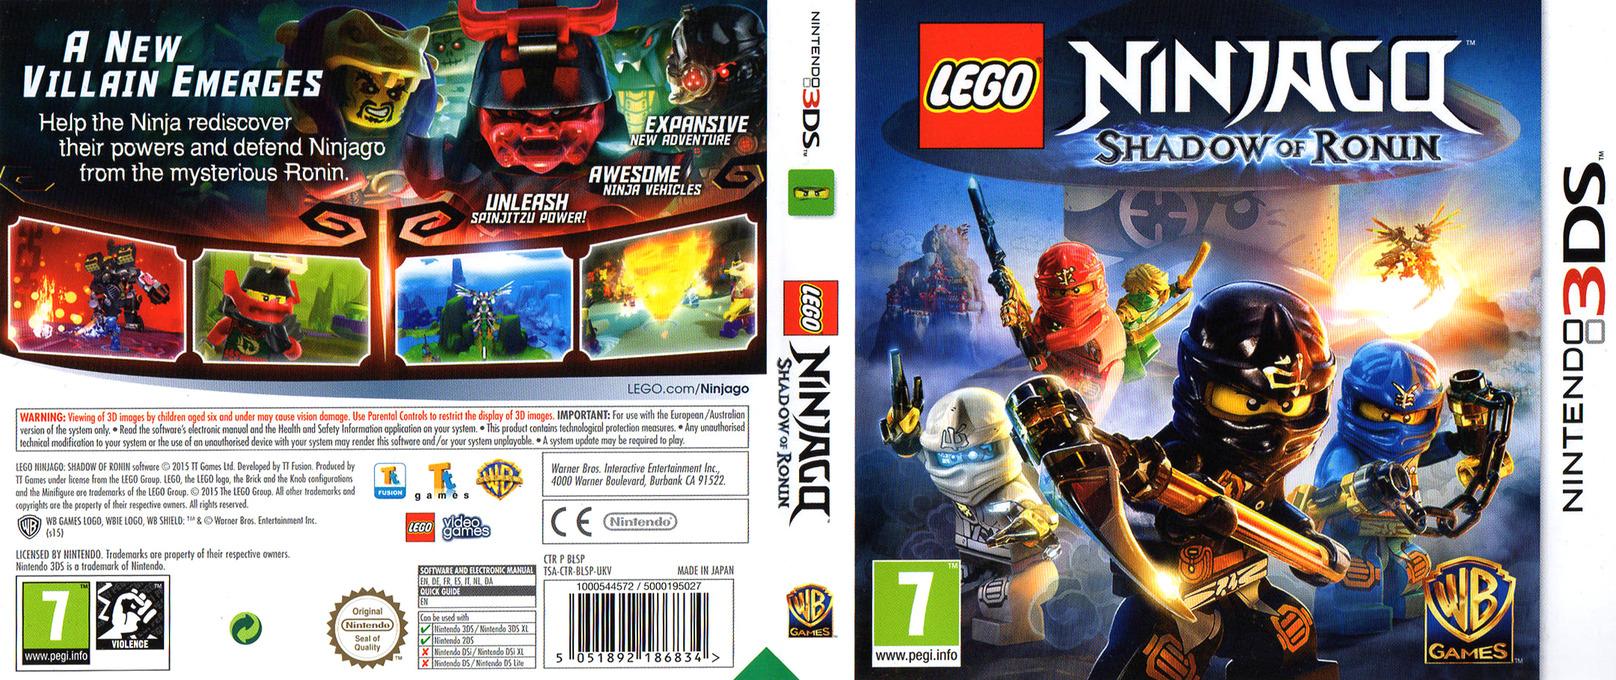 LEGO Ninjago - Shadow of Ronin 3DS coverfullHQ (BLSP)